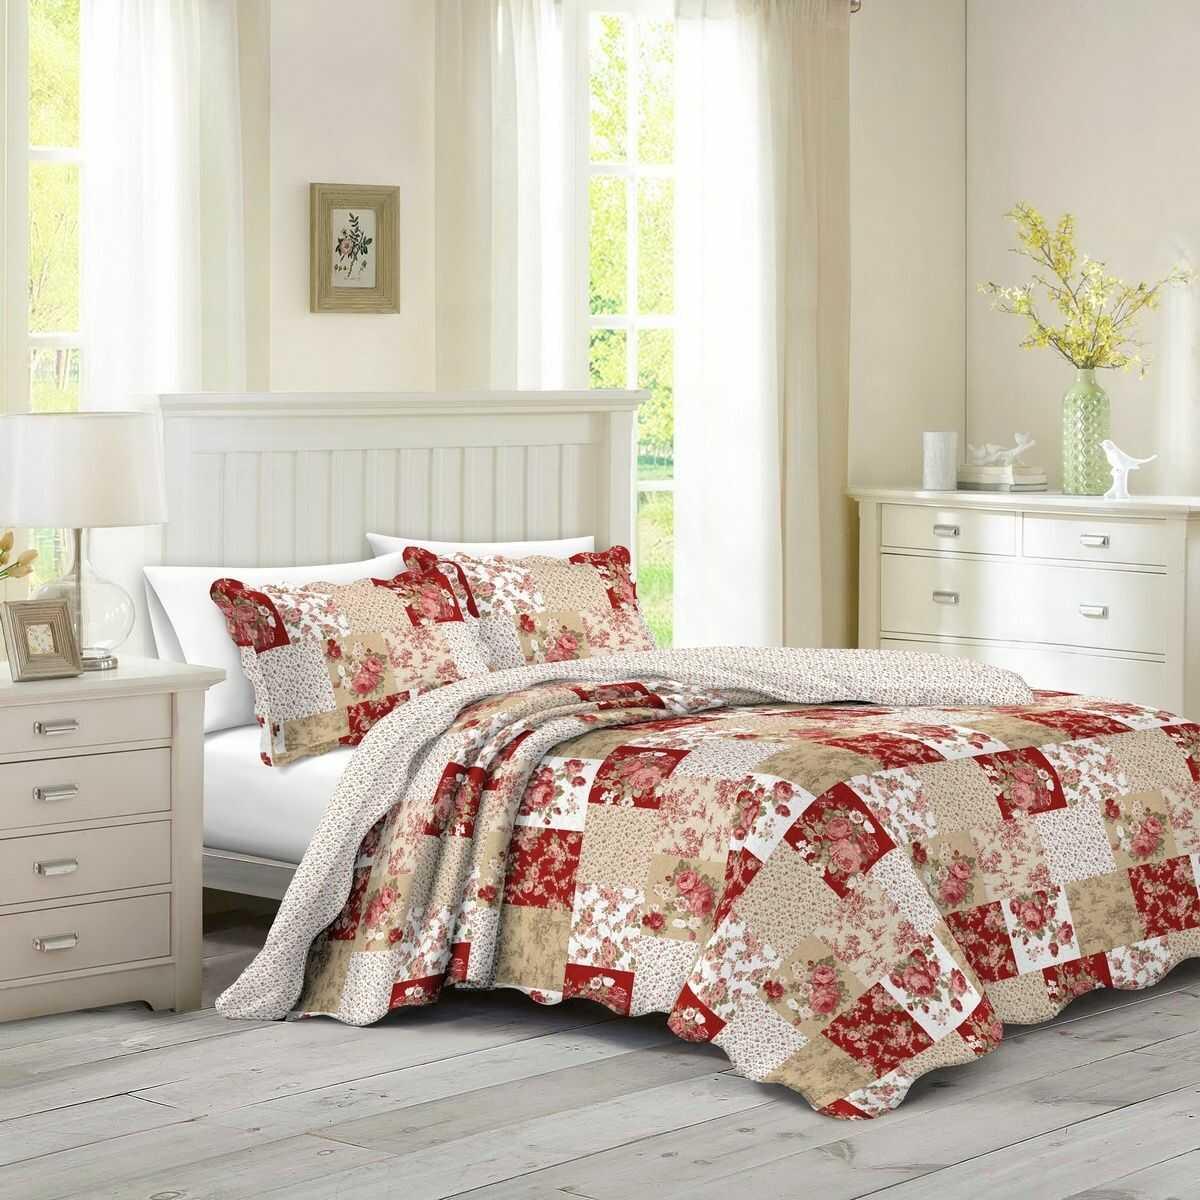 Narzuta na łóżko Patchwork róża Heda, 230 x 250 cm, 2 szt. 50 x 70 cm